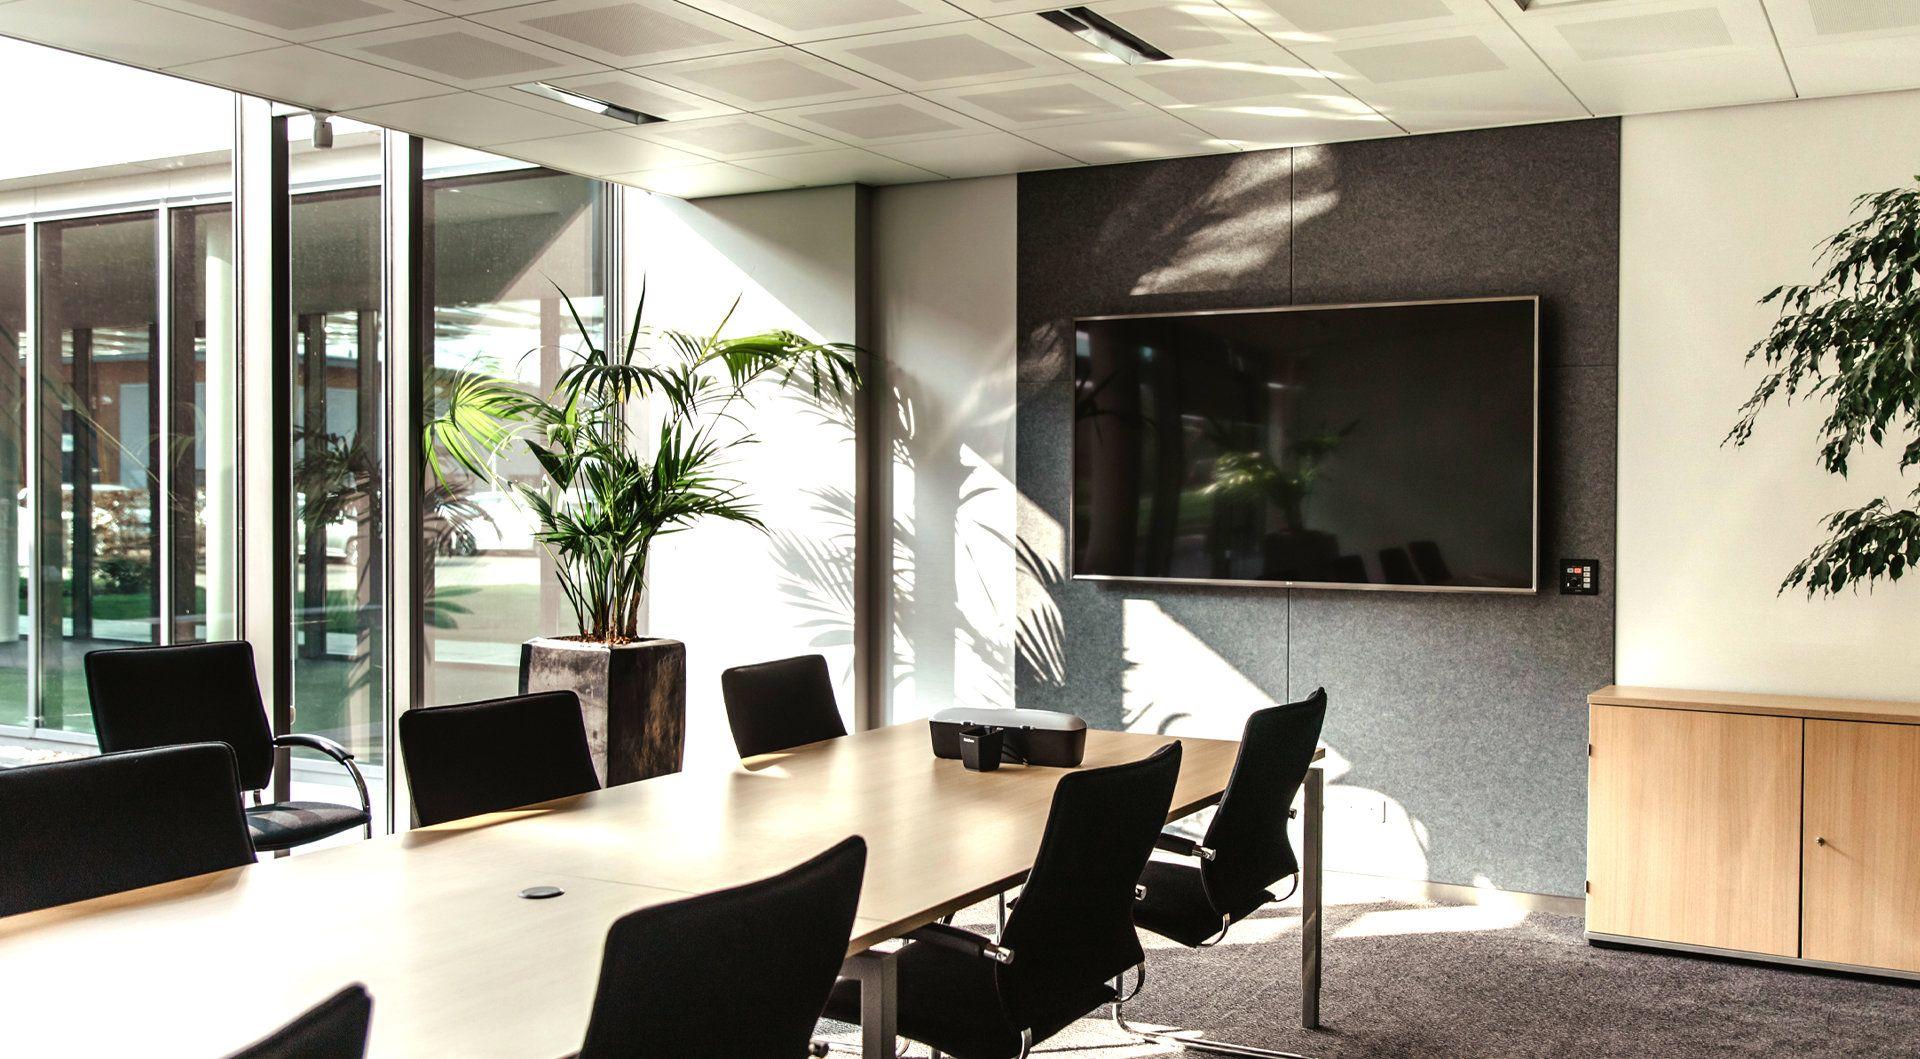 "LG 55SH7DD beeldkrant 139,7 cm (55"") LED Full HD Digitale signage flatscreen Zwart - Case studie de vries"